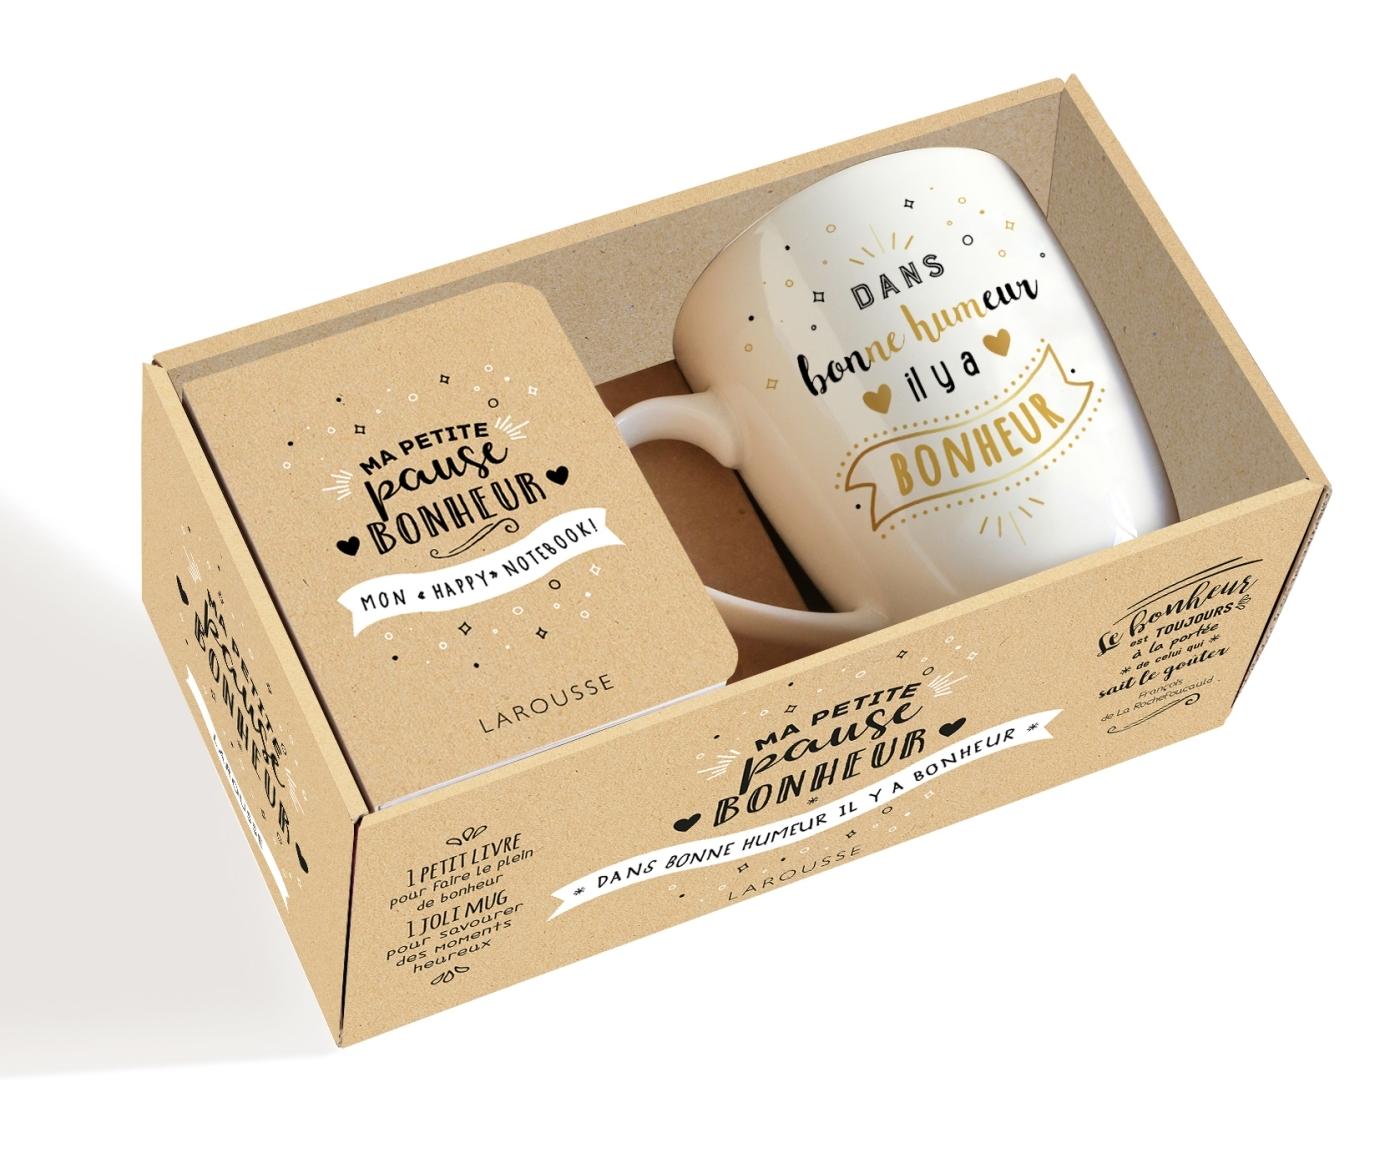 COFFRET MA PETITE PAUSE BONHEUR